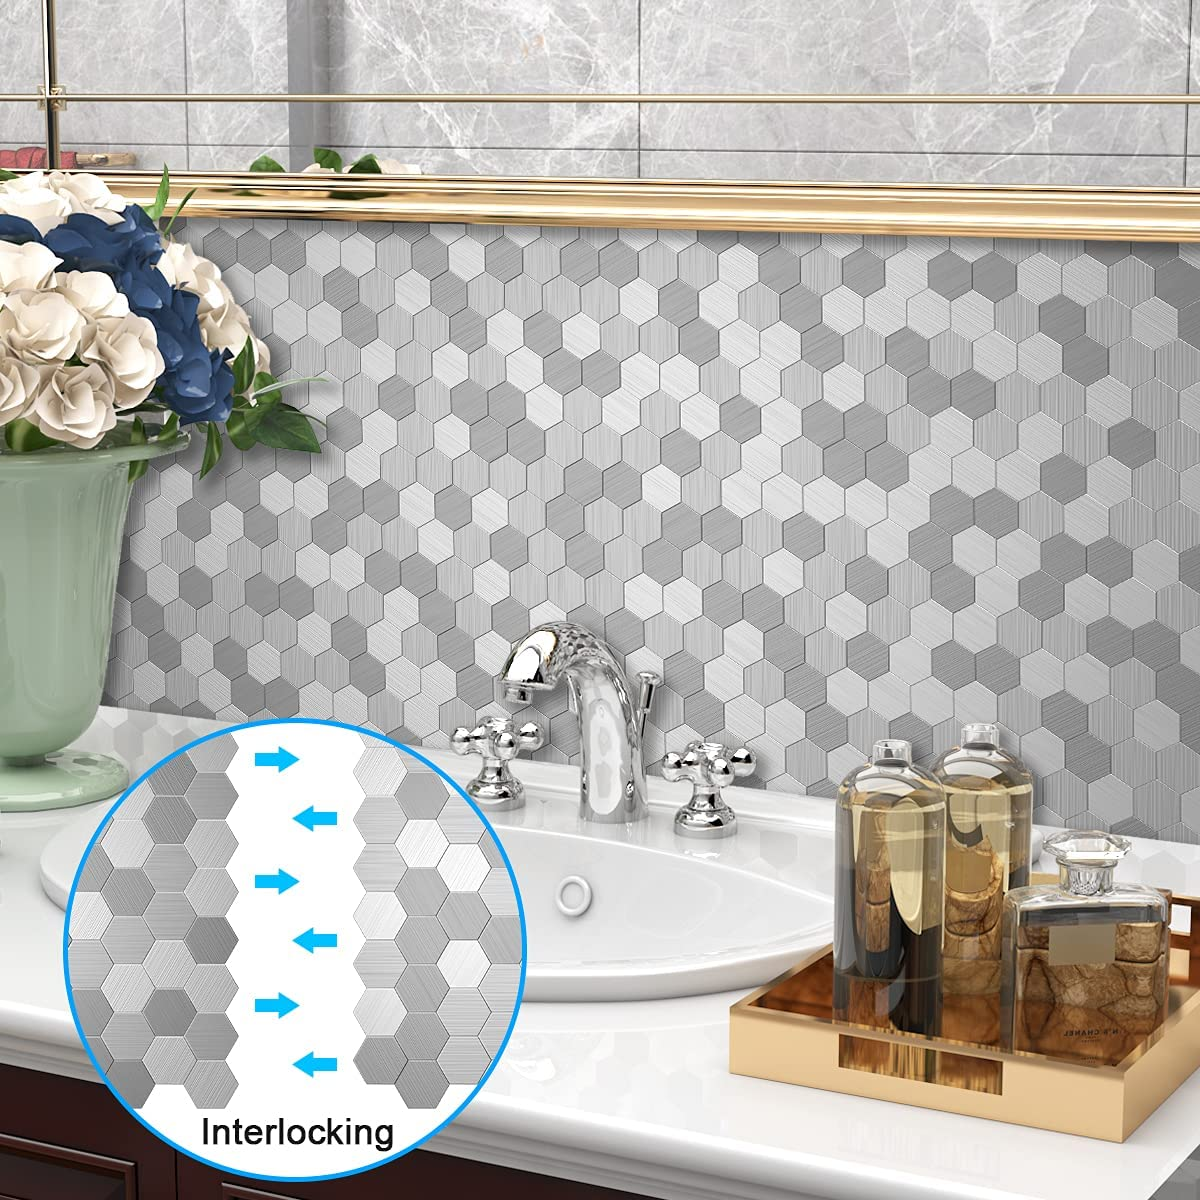 Buy Benice Hexagon Kitchen Backsplash Peel Stick Tiles Stick On Backsplash Bathroom Wall Tiles Mosaic 5sheets Silver Online In Indonesia B08cjz1m2n